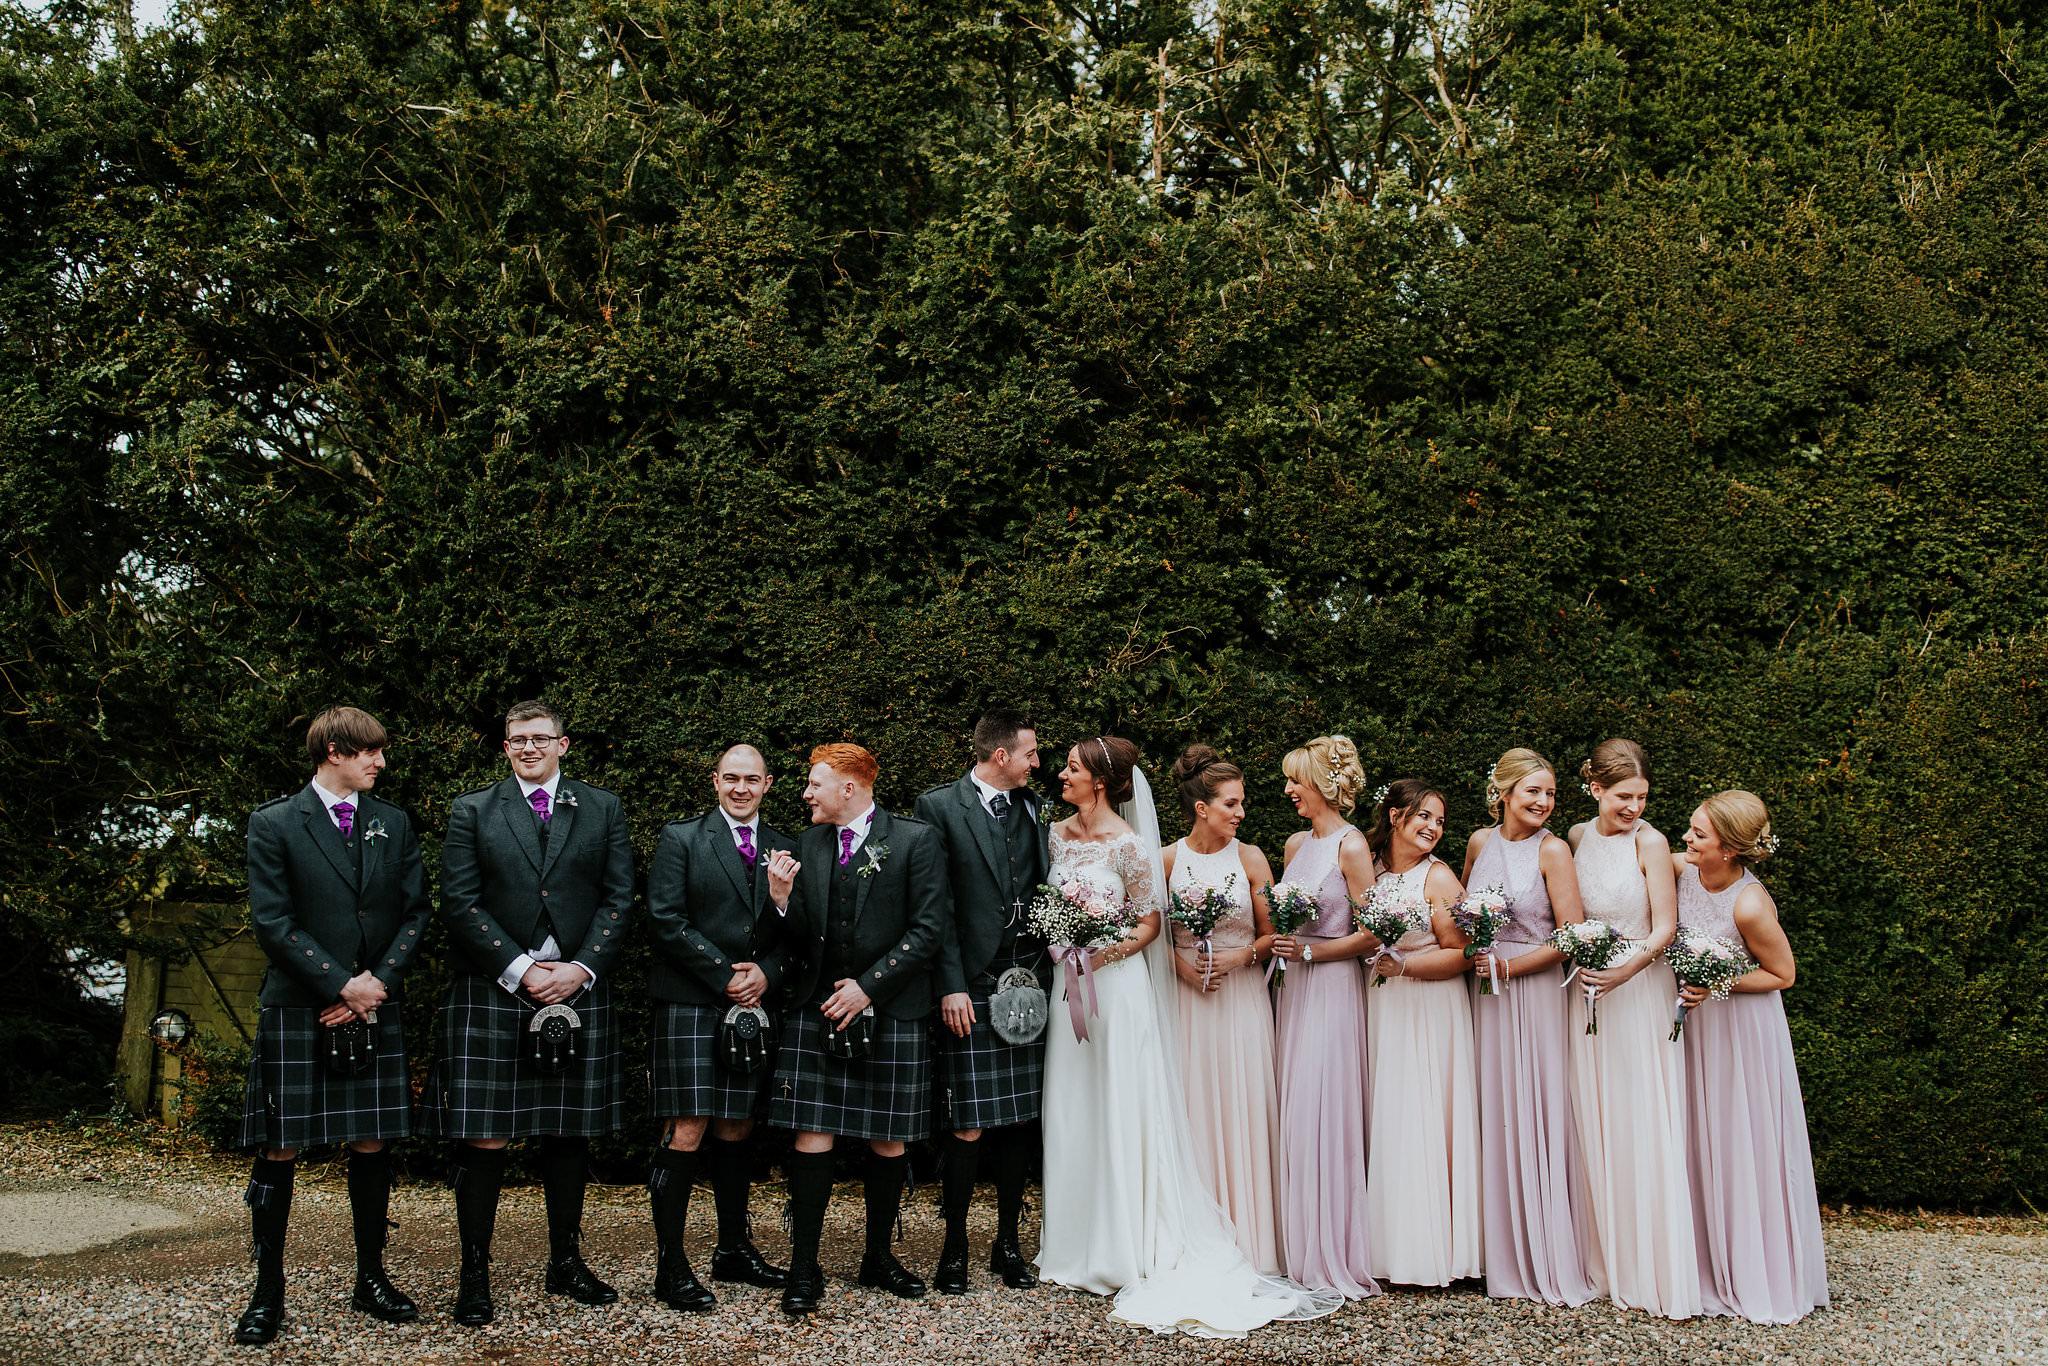 kirknewton stables wedding photographer (47).jpg